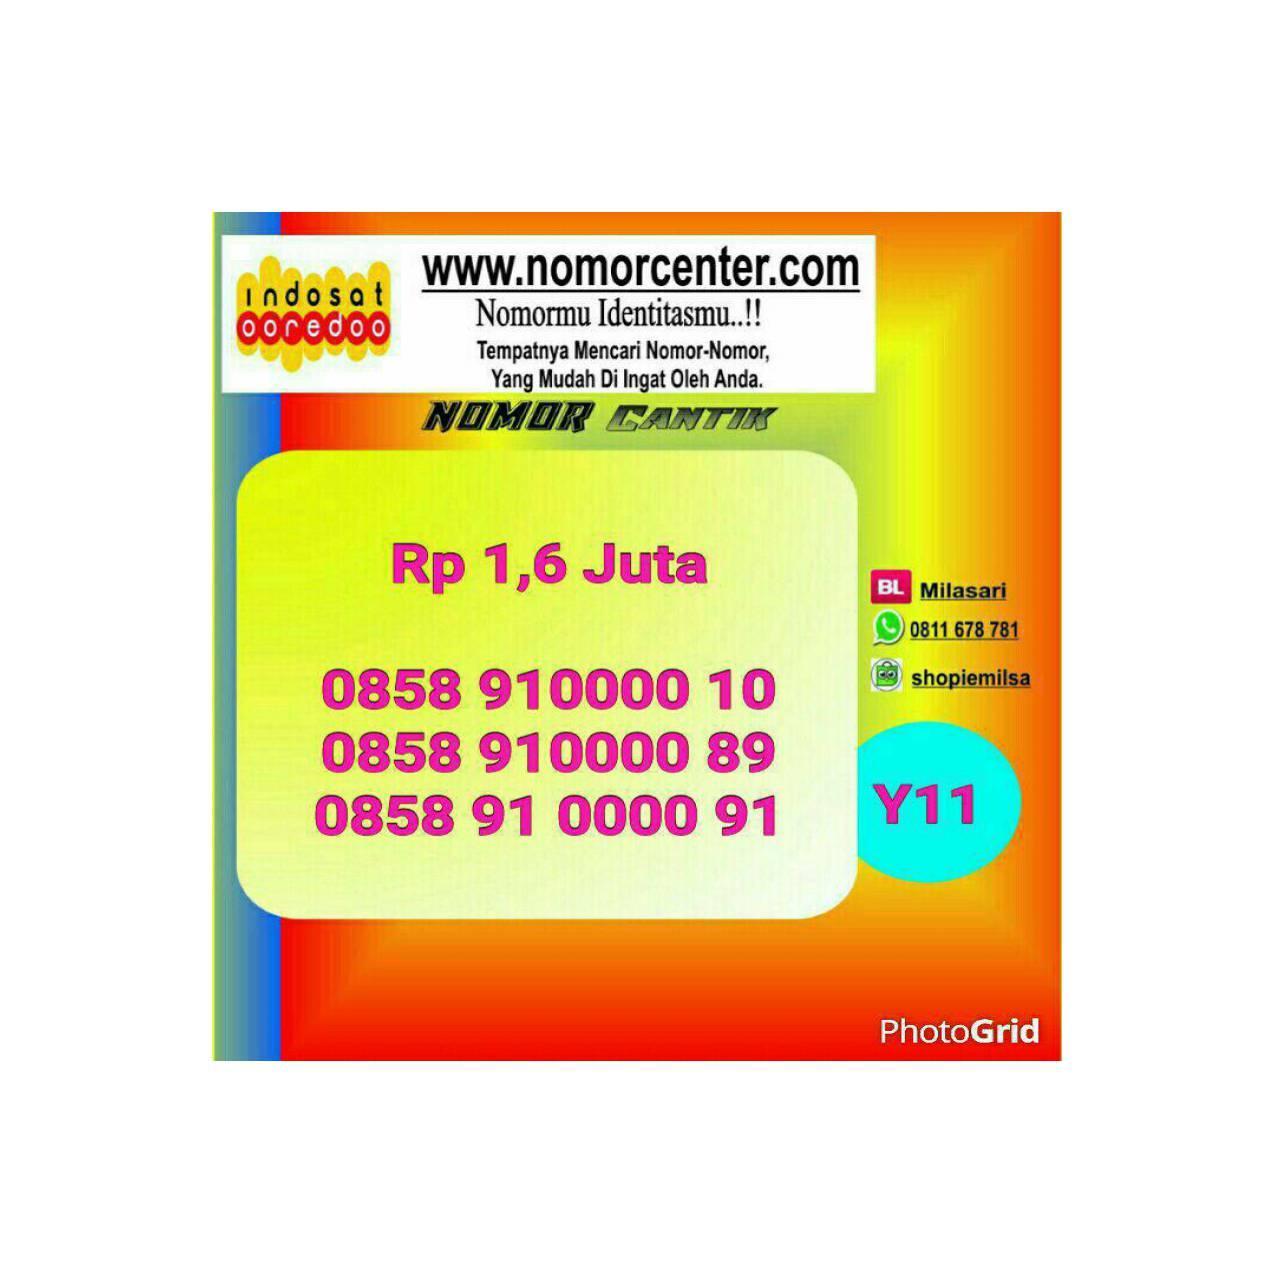 Indosat Im 3 Nomor Cantik 0857 191 70000 Daftar Harga Terlengkap Source · Nomor Cantik Indosat